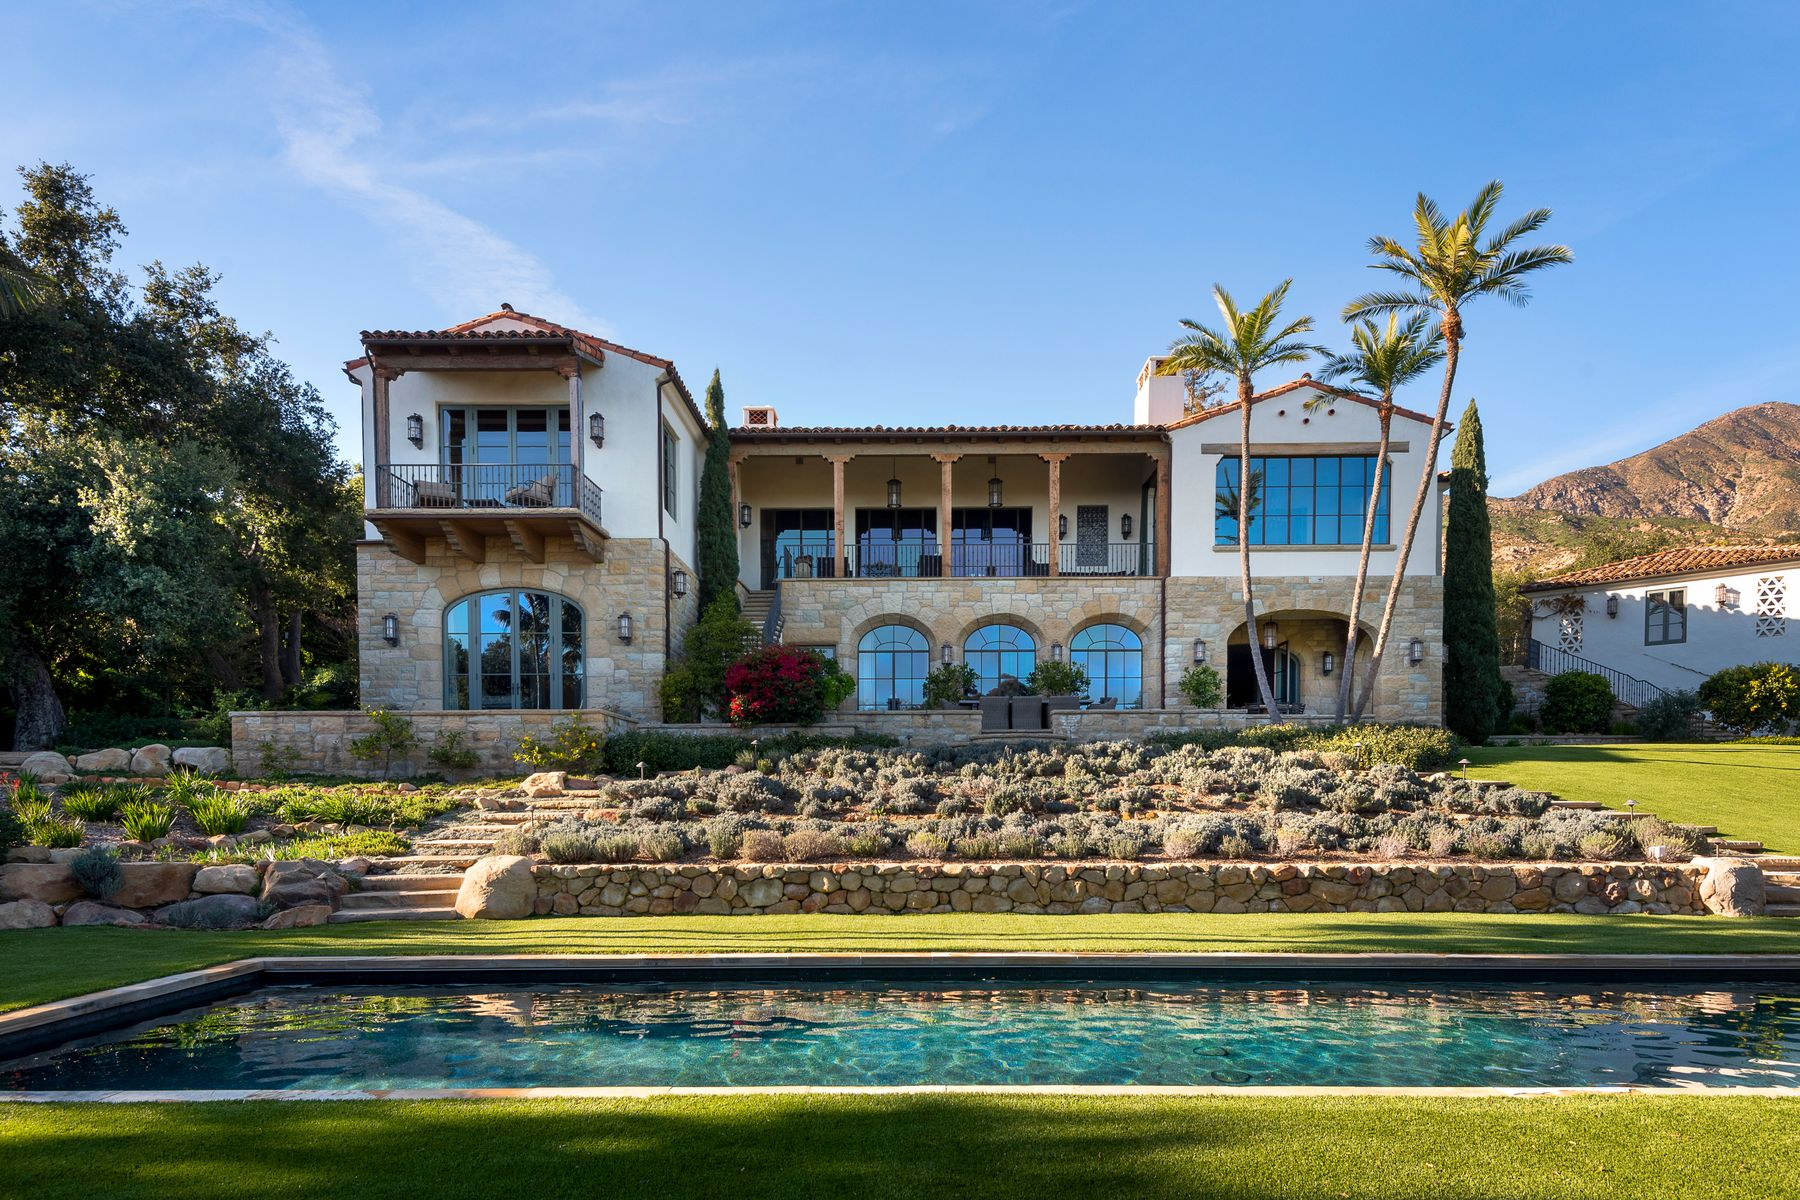 Single Family Homes for Sale at Spanish Colonial Treasure 1333 E Mountain Dr Montecito, California 93108 United States